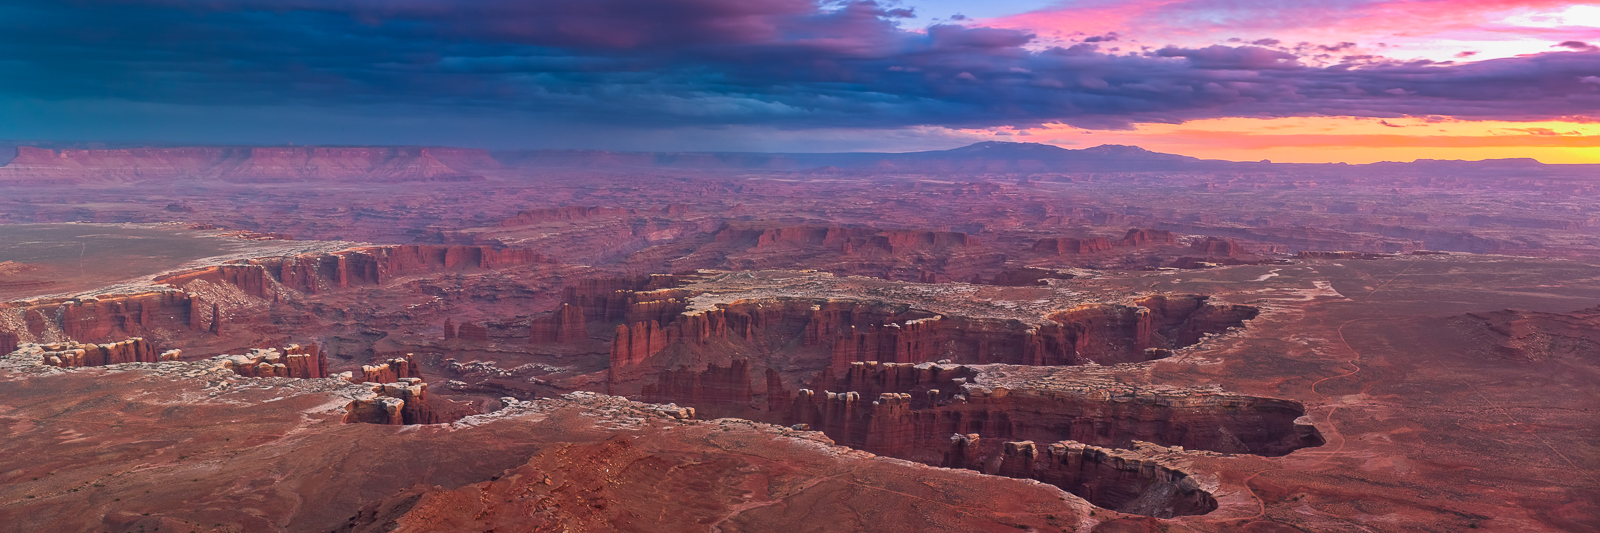 Canyonland Evening Time,Canyonlands National Park,Desert,Horizontal,Orange,Panoramic,Utah,landscape, photo